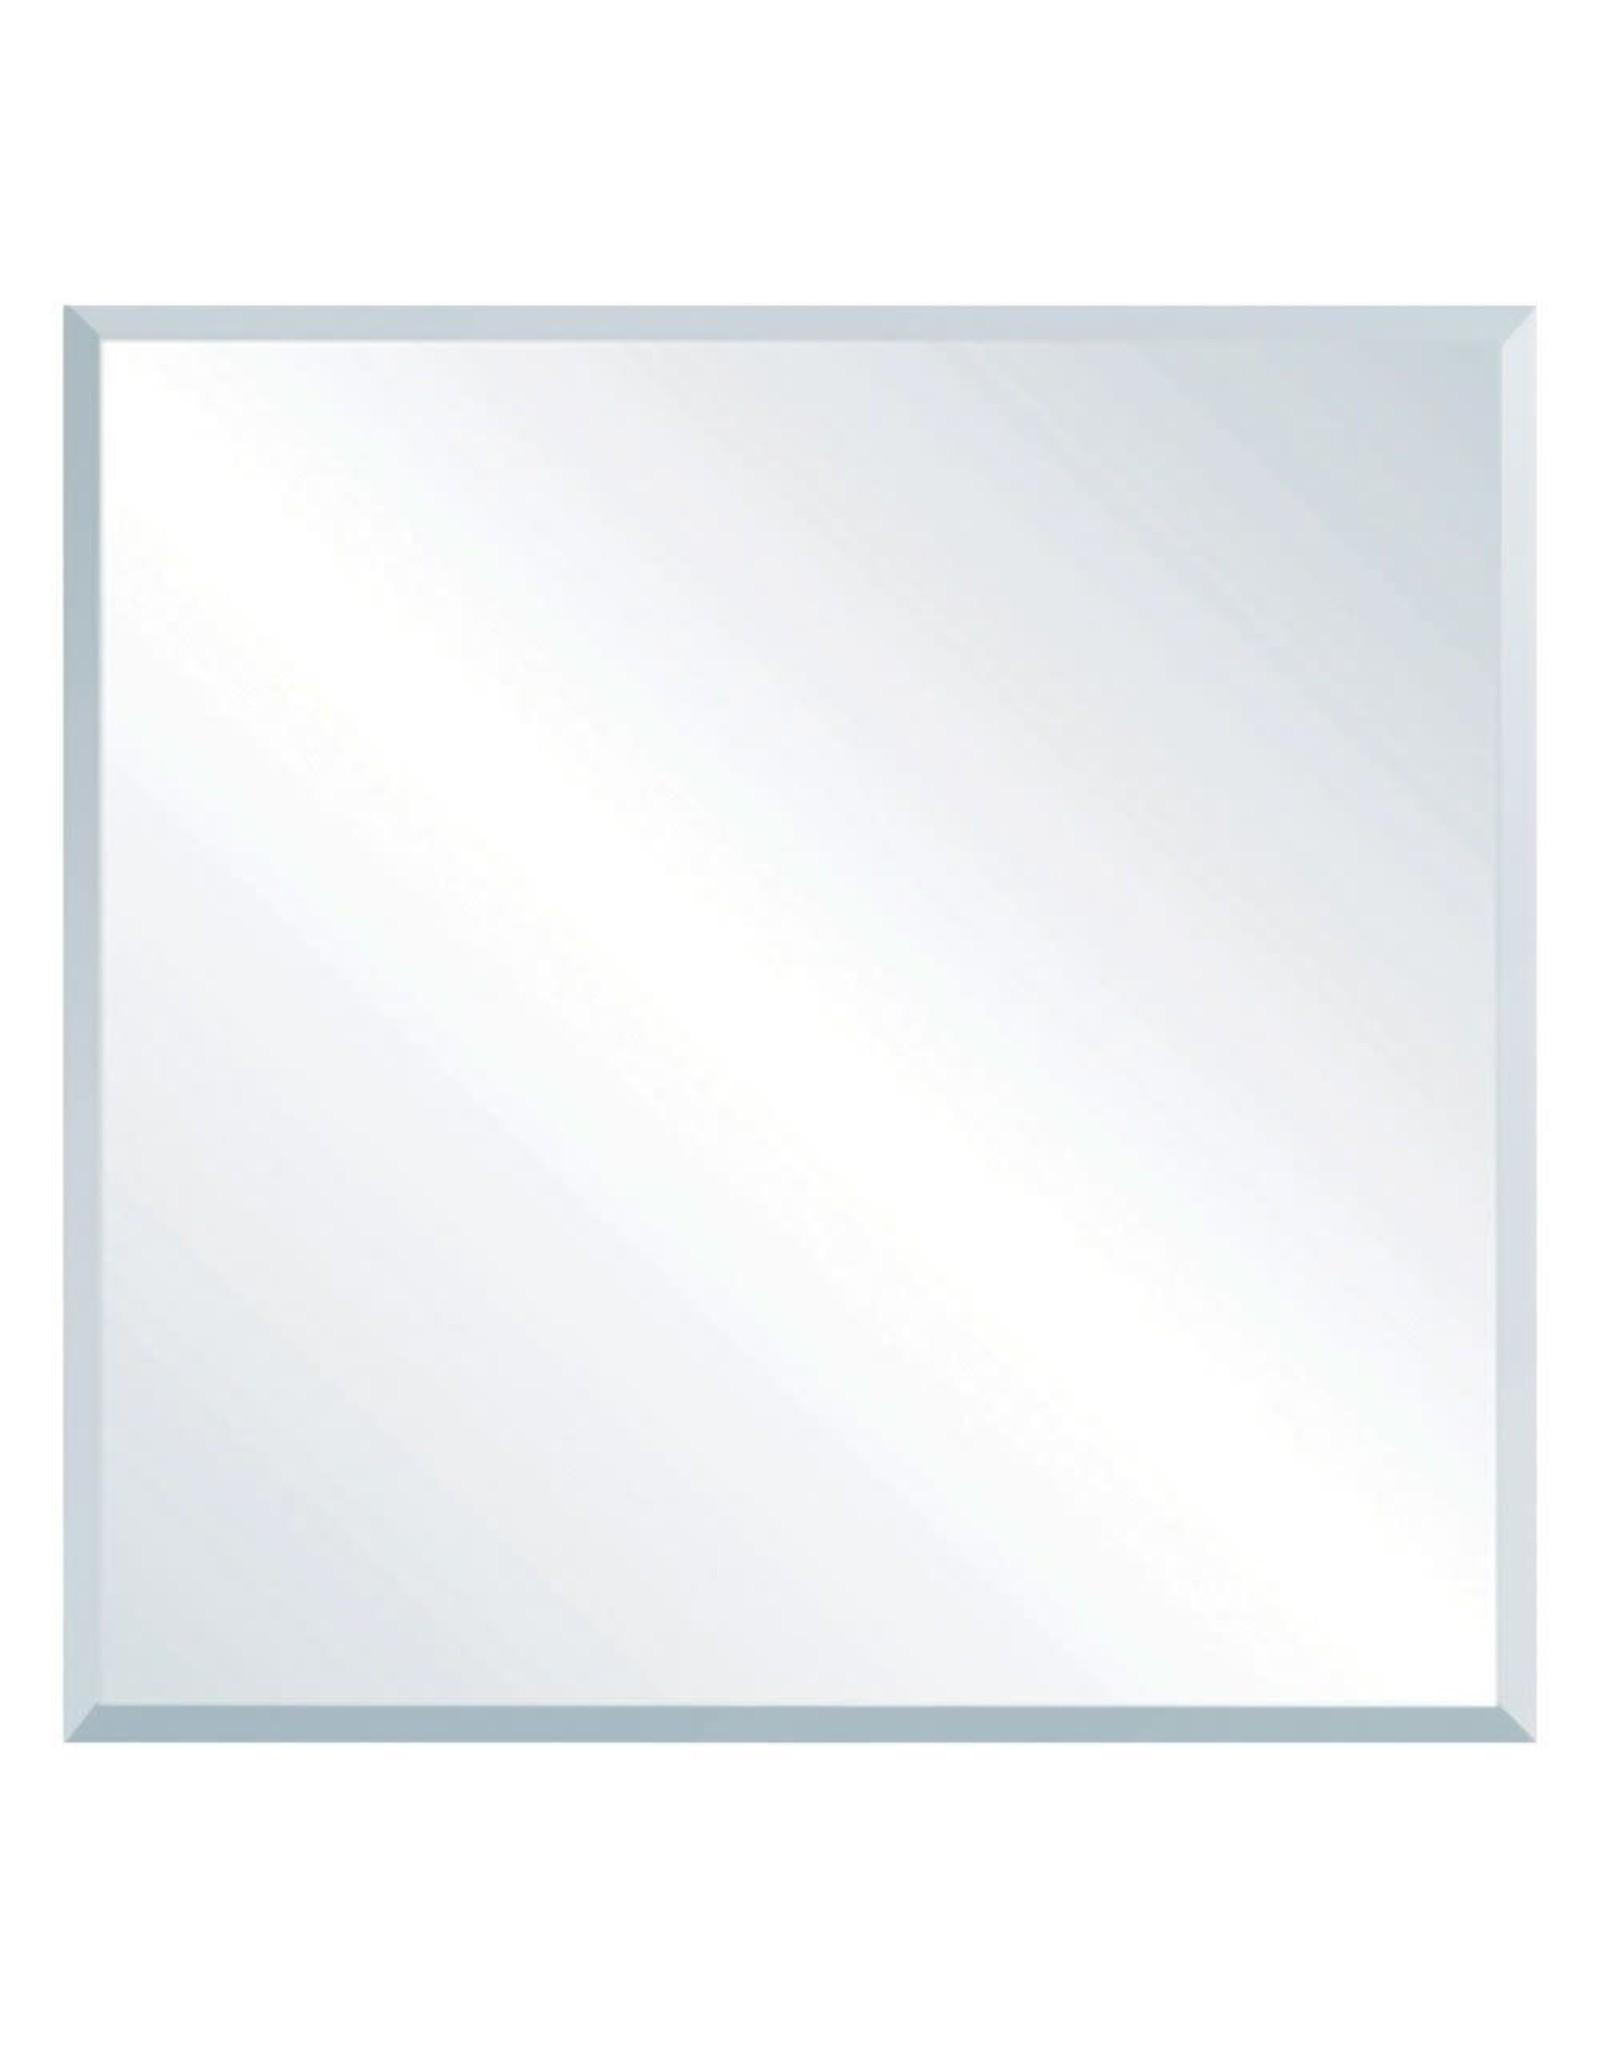 FIENZA 1000x800, FIENZA, Bevel Edge Mirror